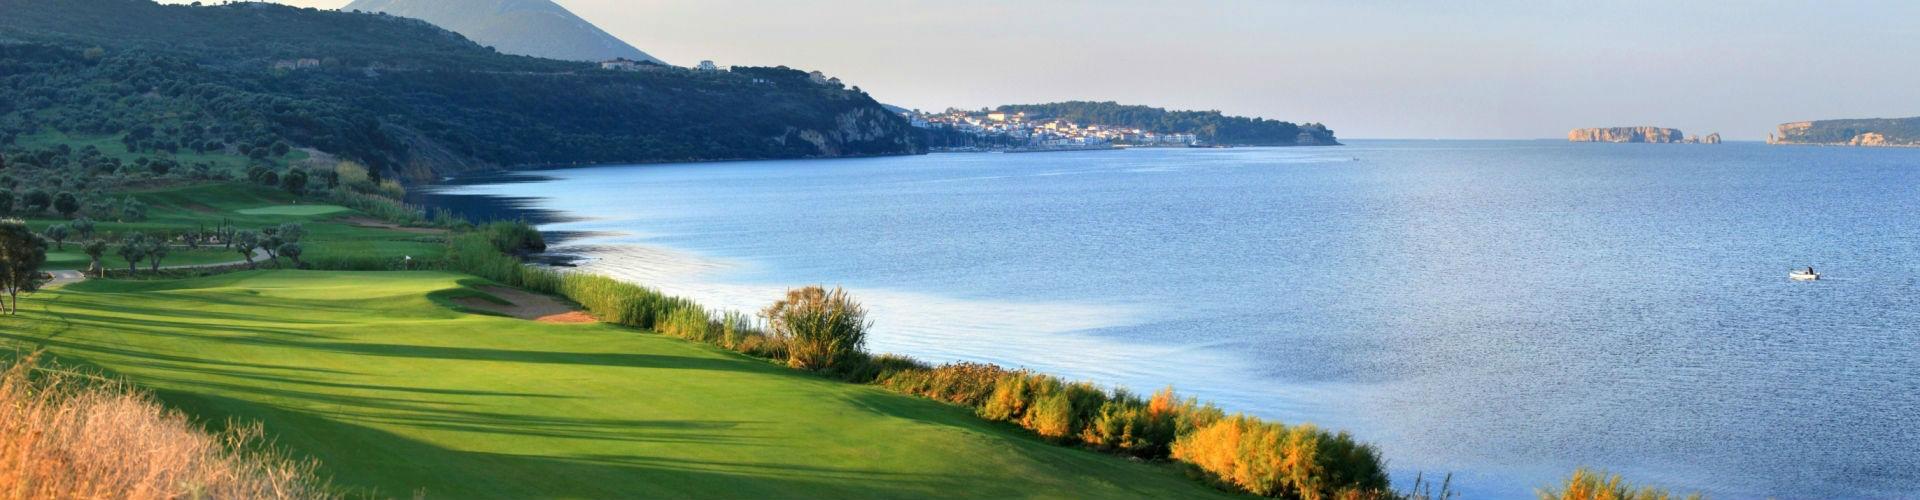 Golfresor Grekland - golfreseguiden.se